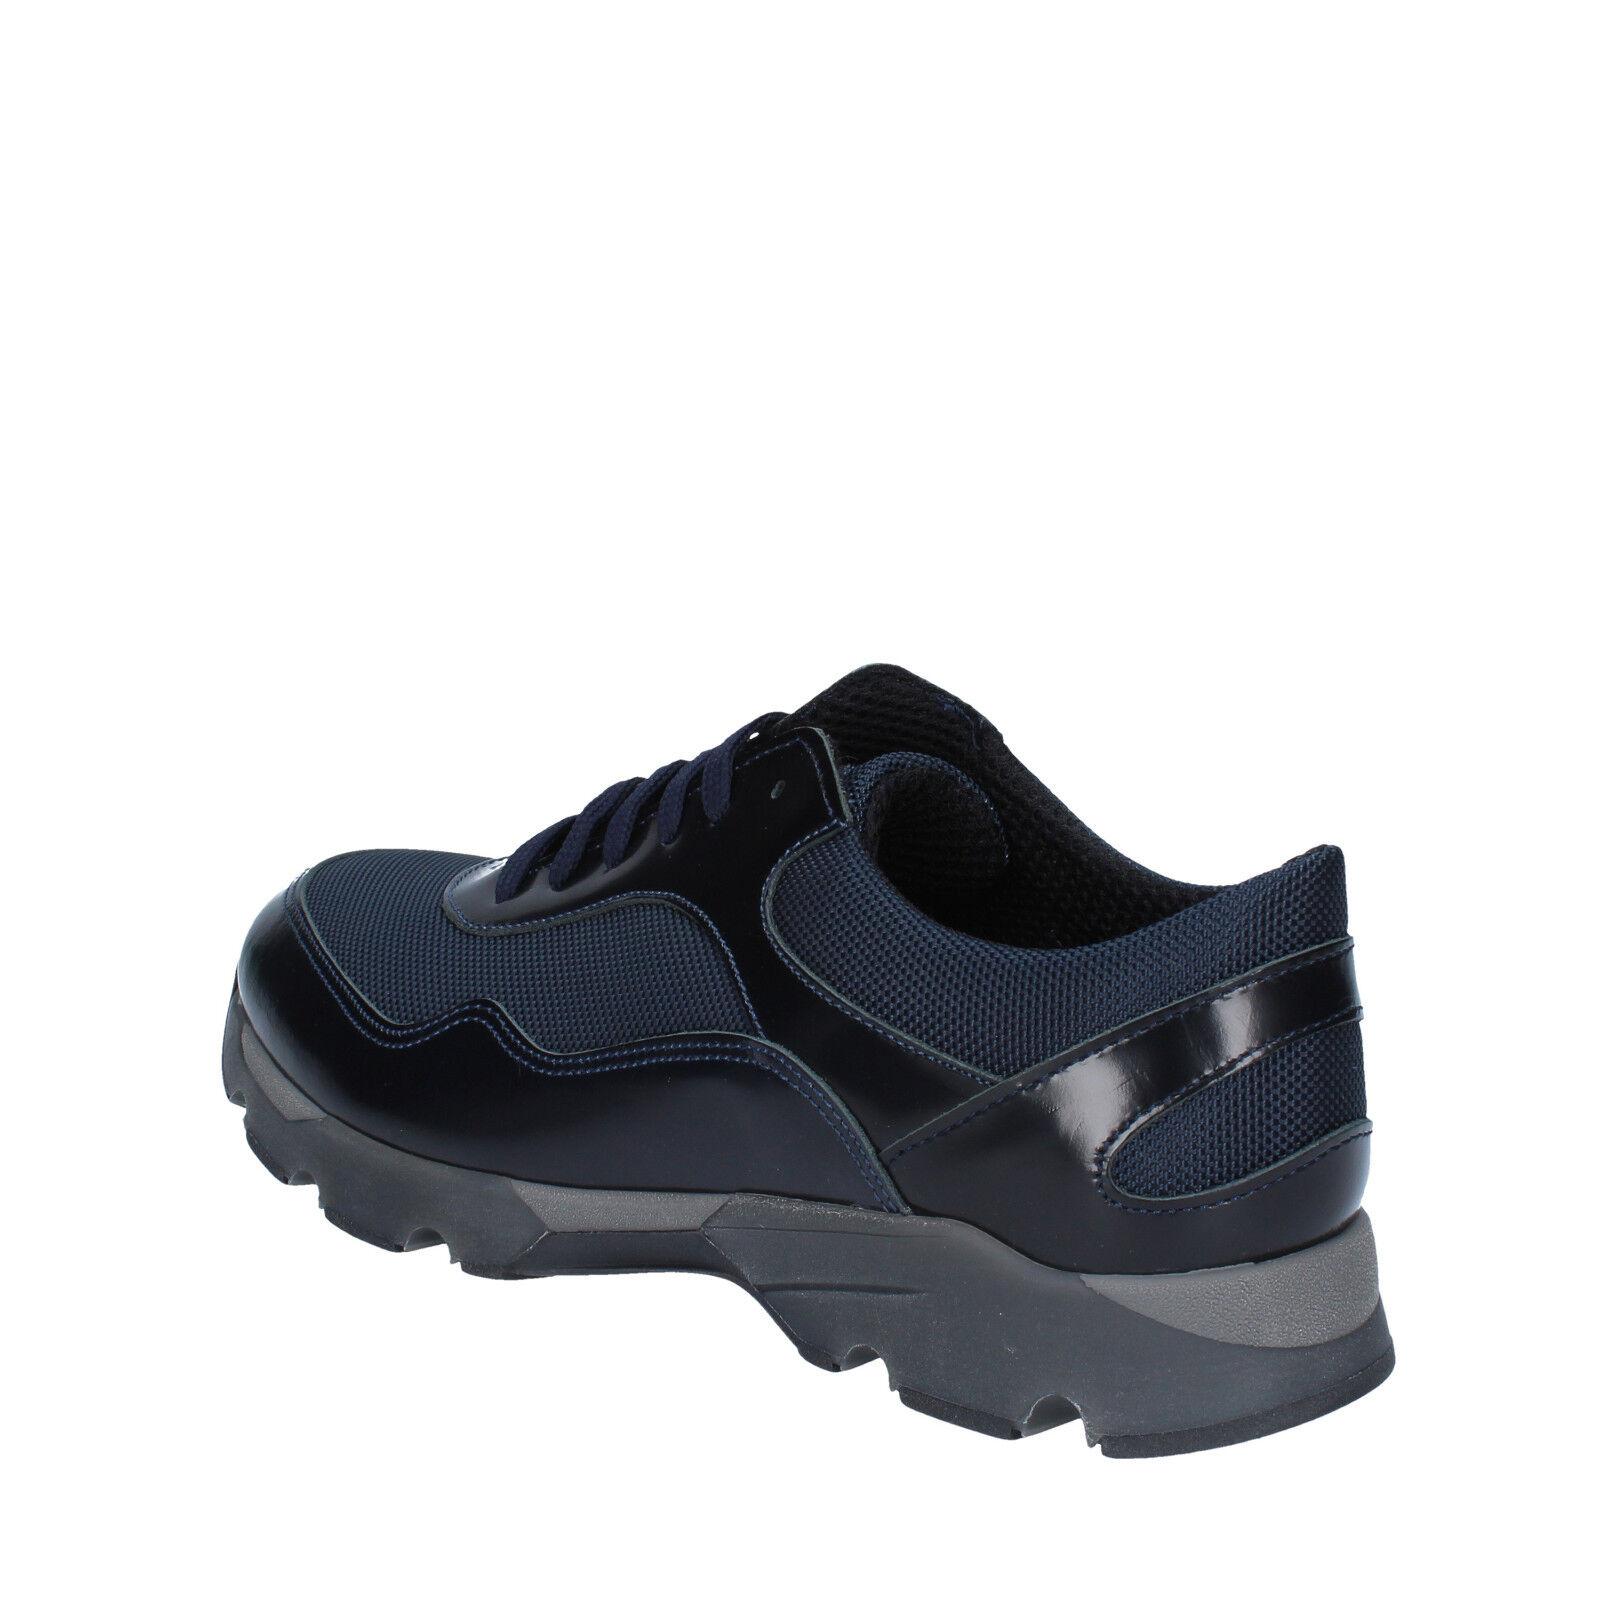 Herren schuhe BALDININI 43 Turnschuhe blau blau blau textil leder BY538-43    567216